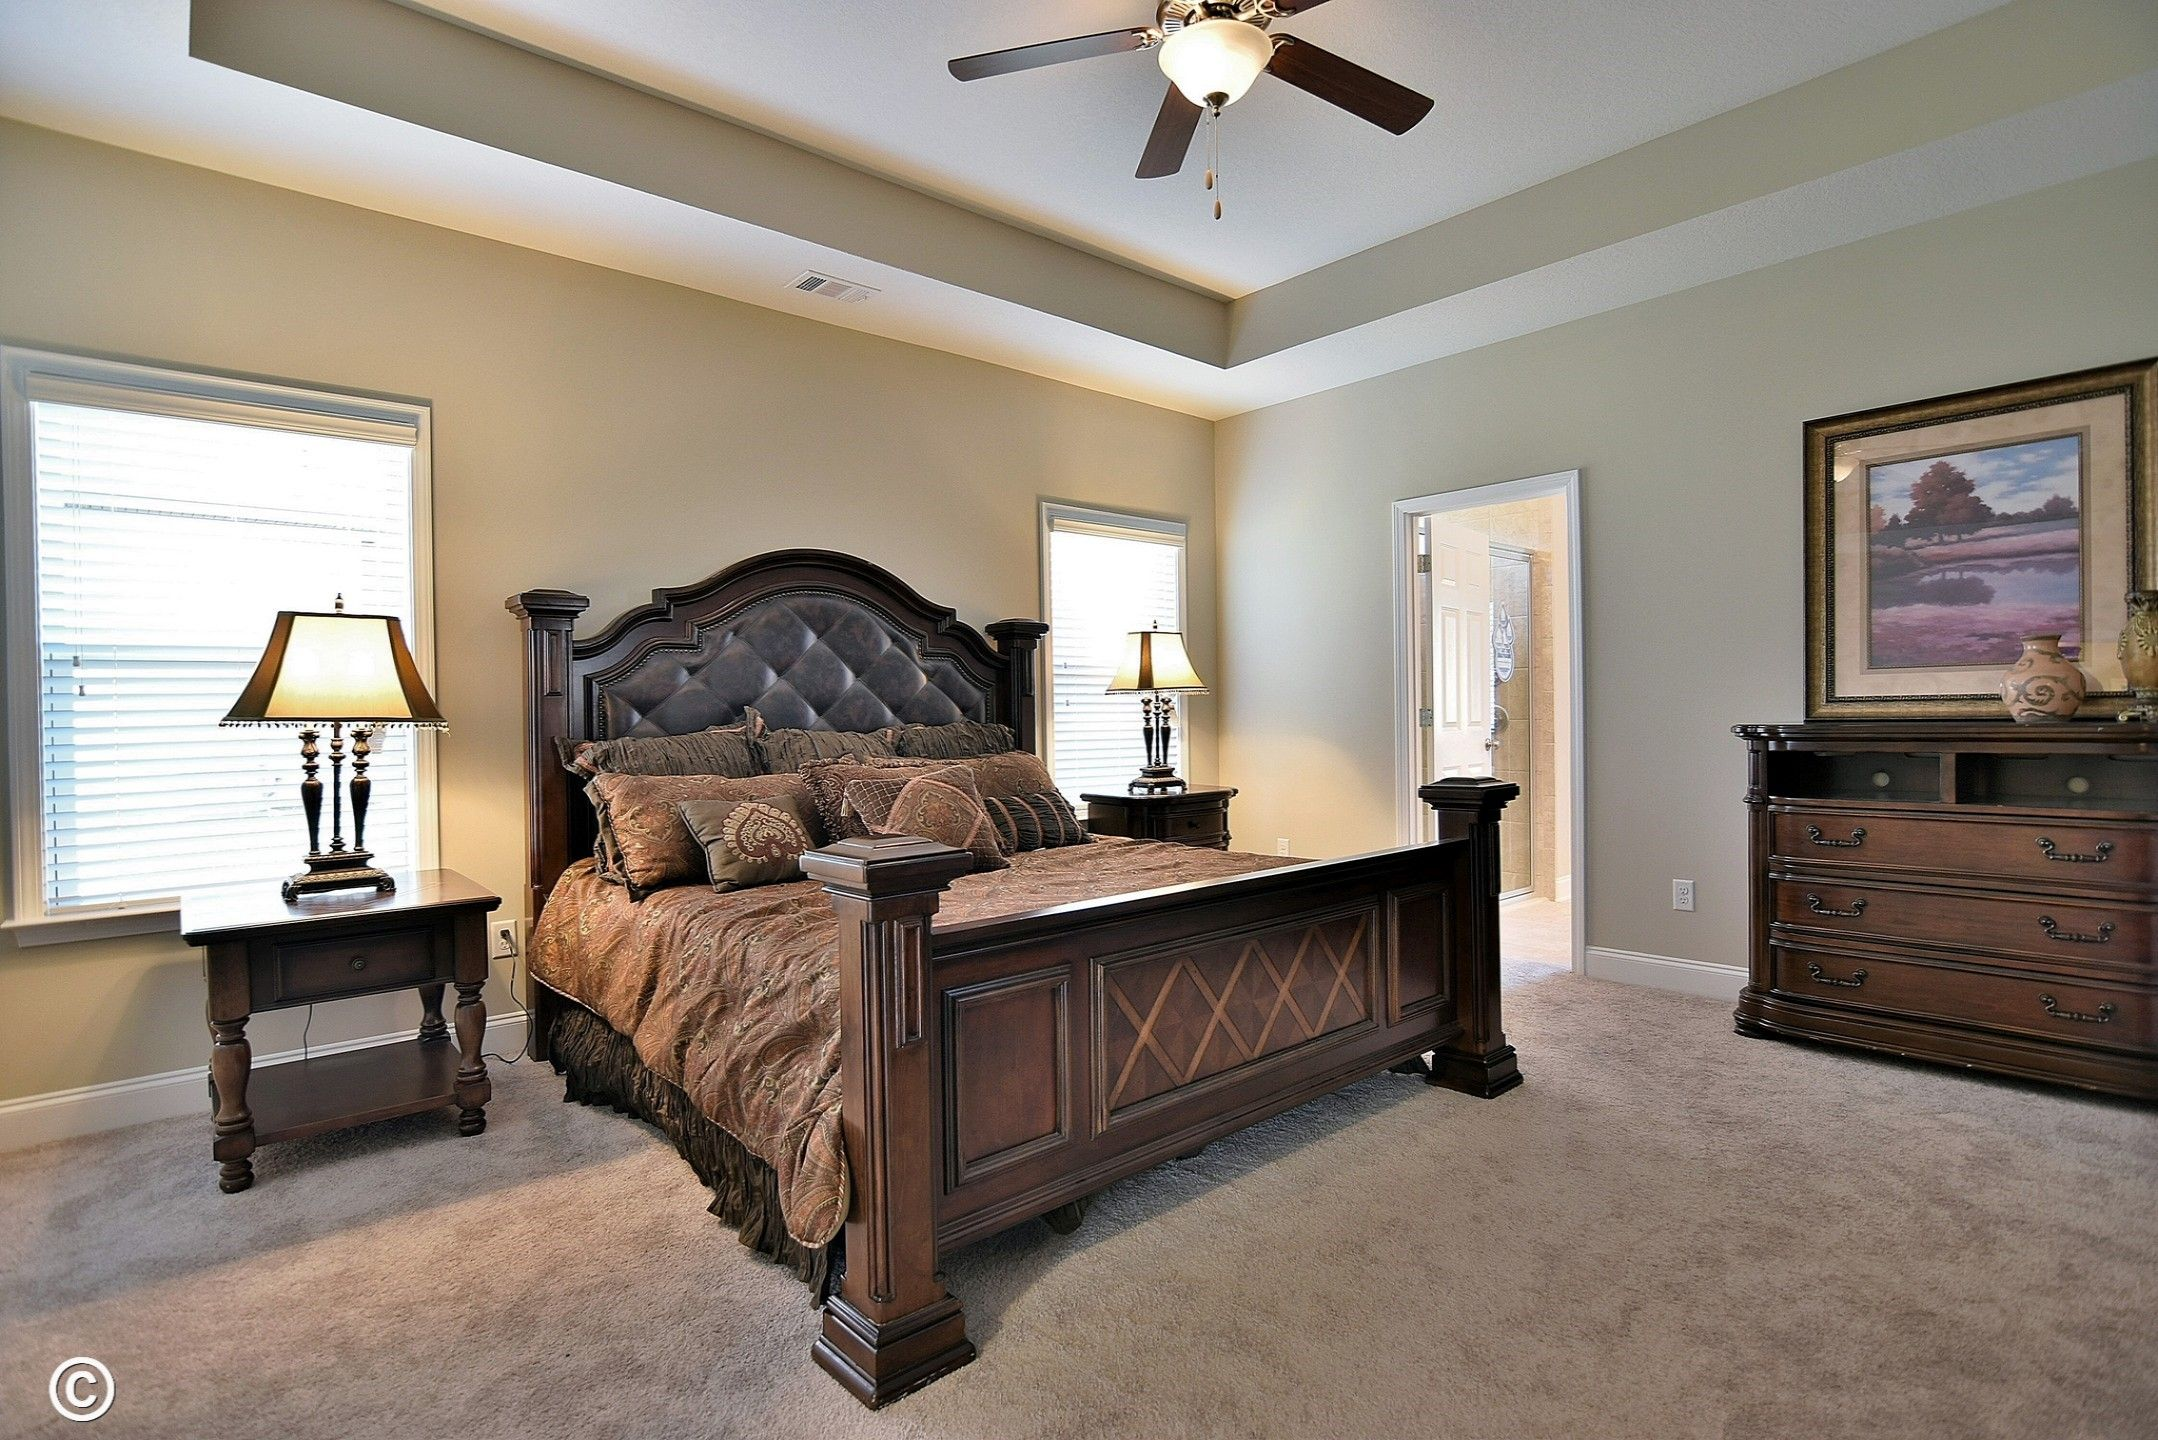 New Homes for Sale in Columbus GA & Auburn AL New homes